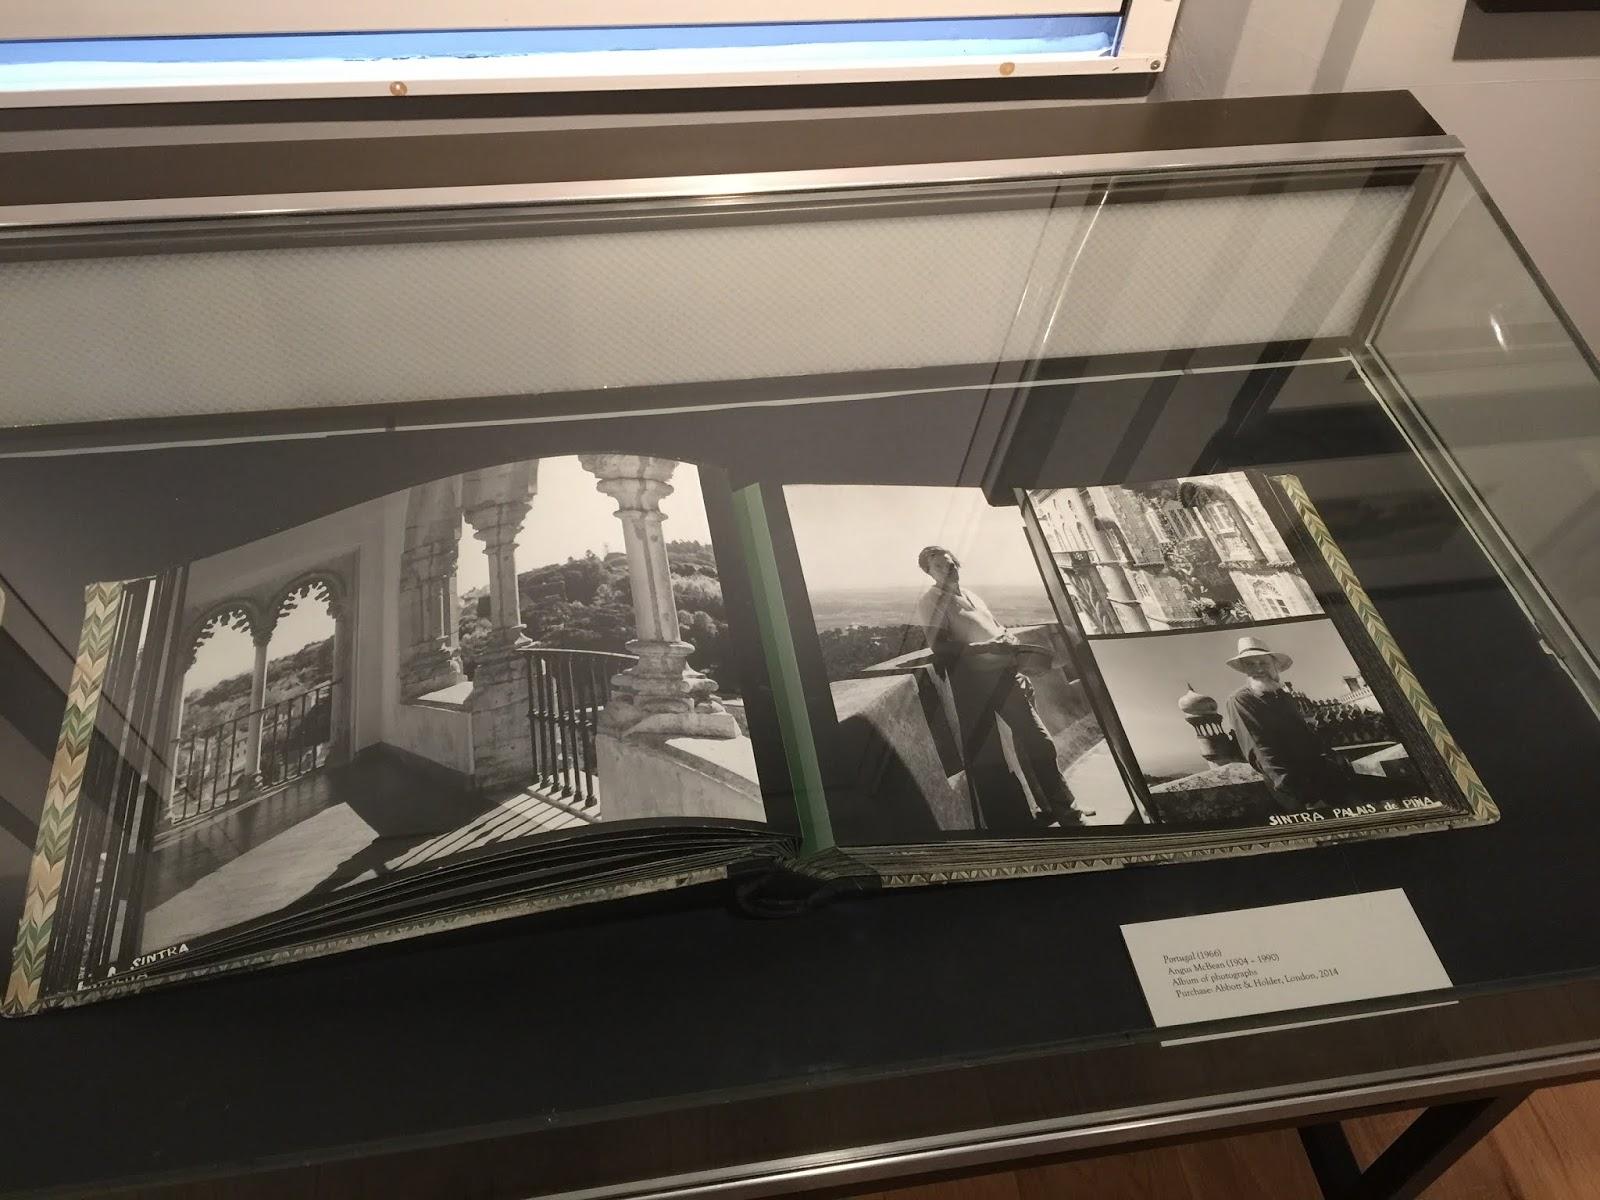 afd98d57332 Angus McBean's personal album of travel photographs